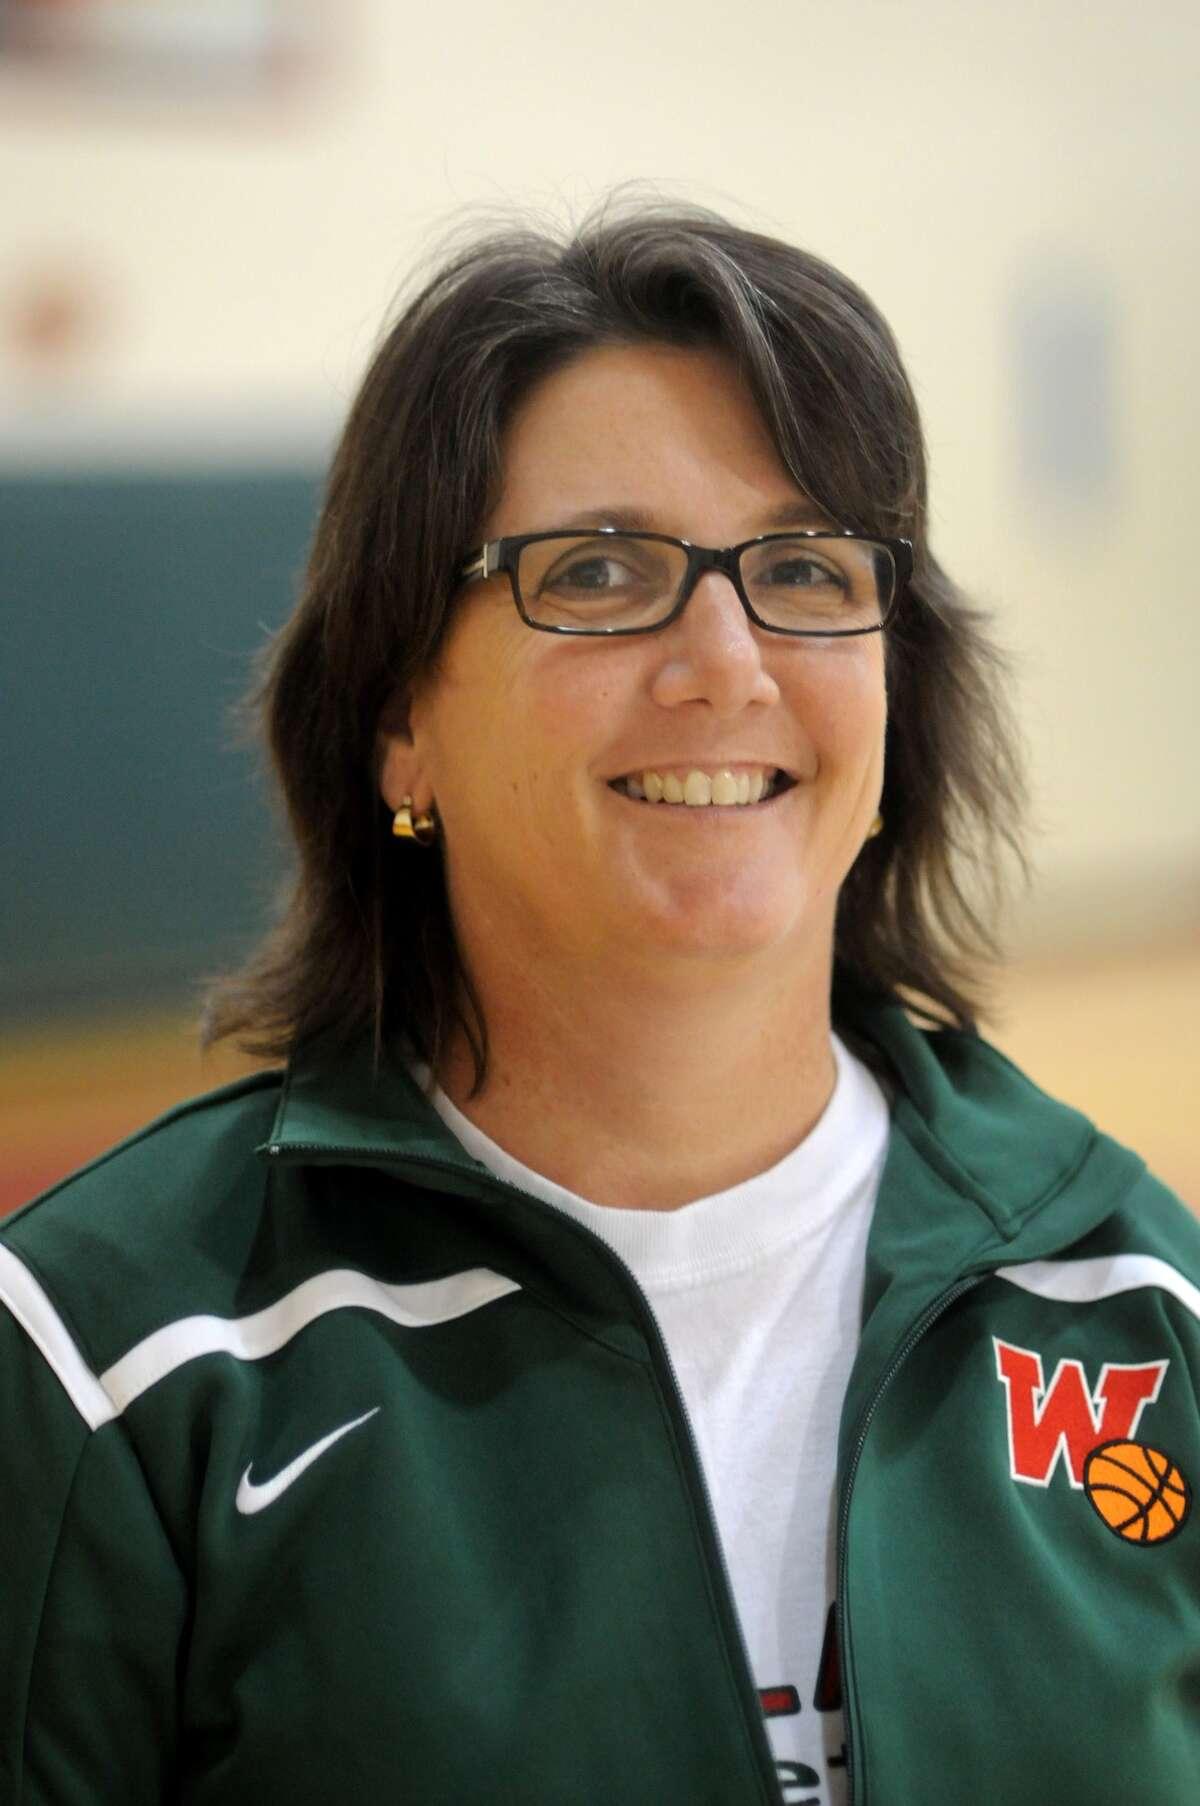 TWHS Head Coach Dana Bruton